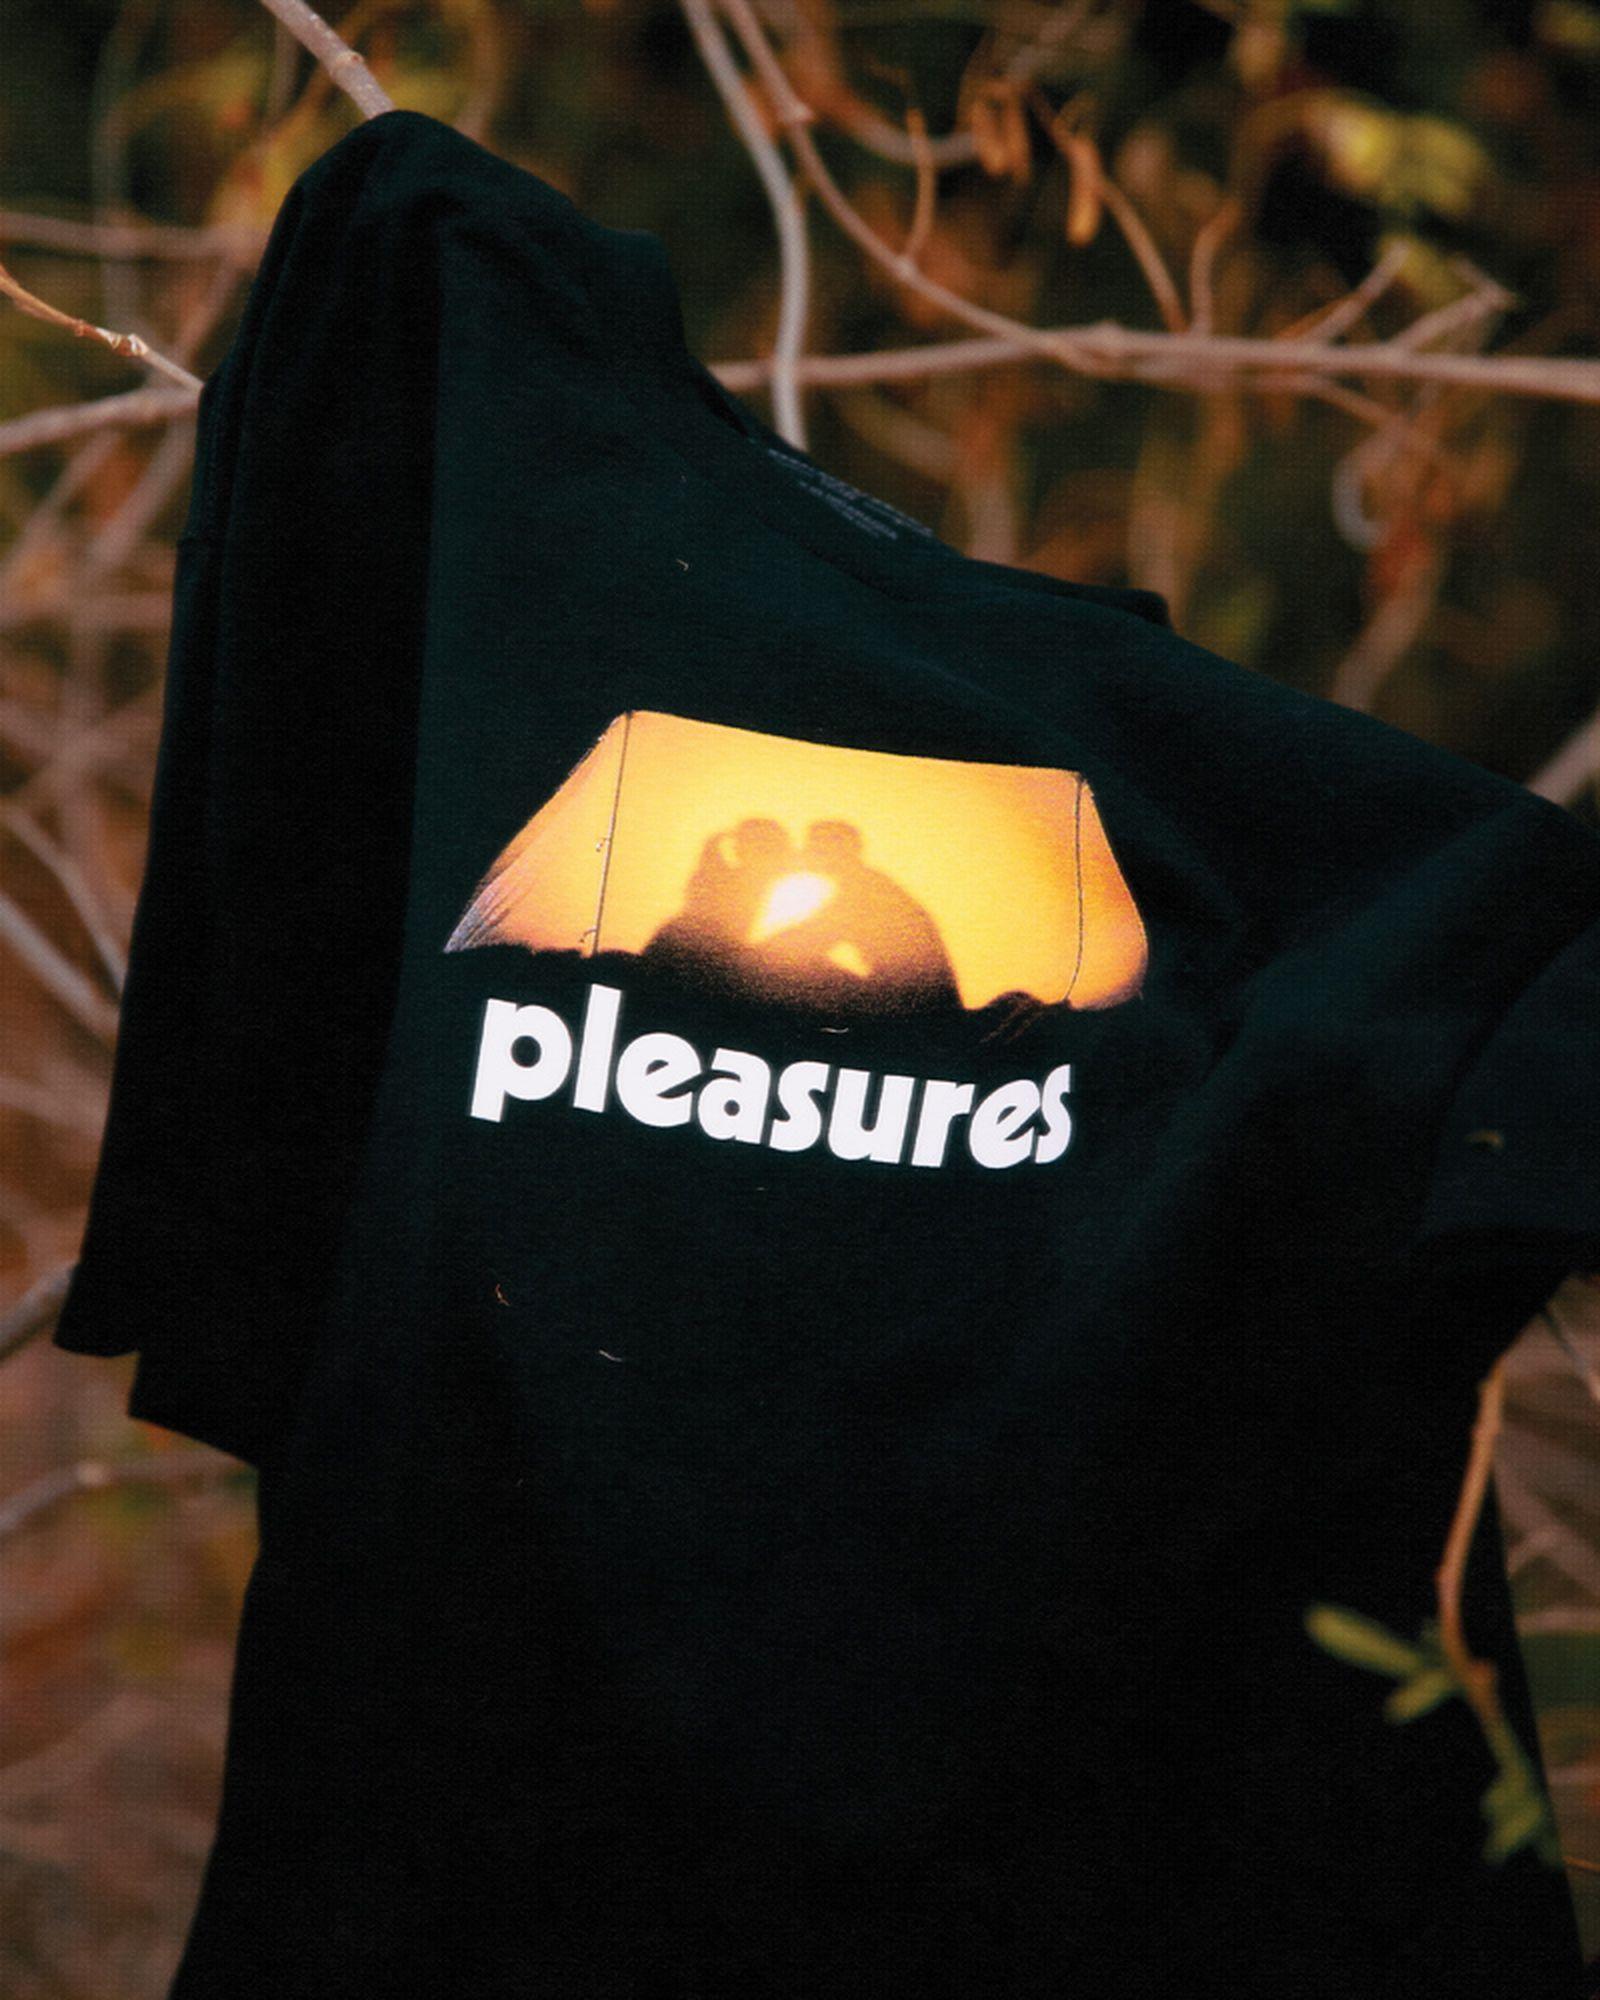 bodega-pleasures-anniversary-capsule-collection-17